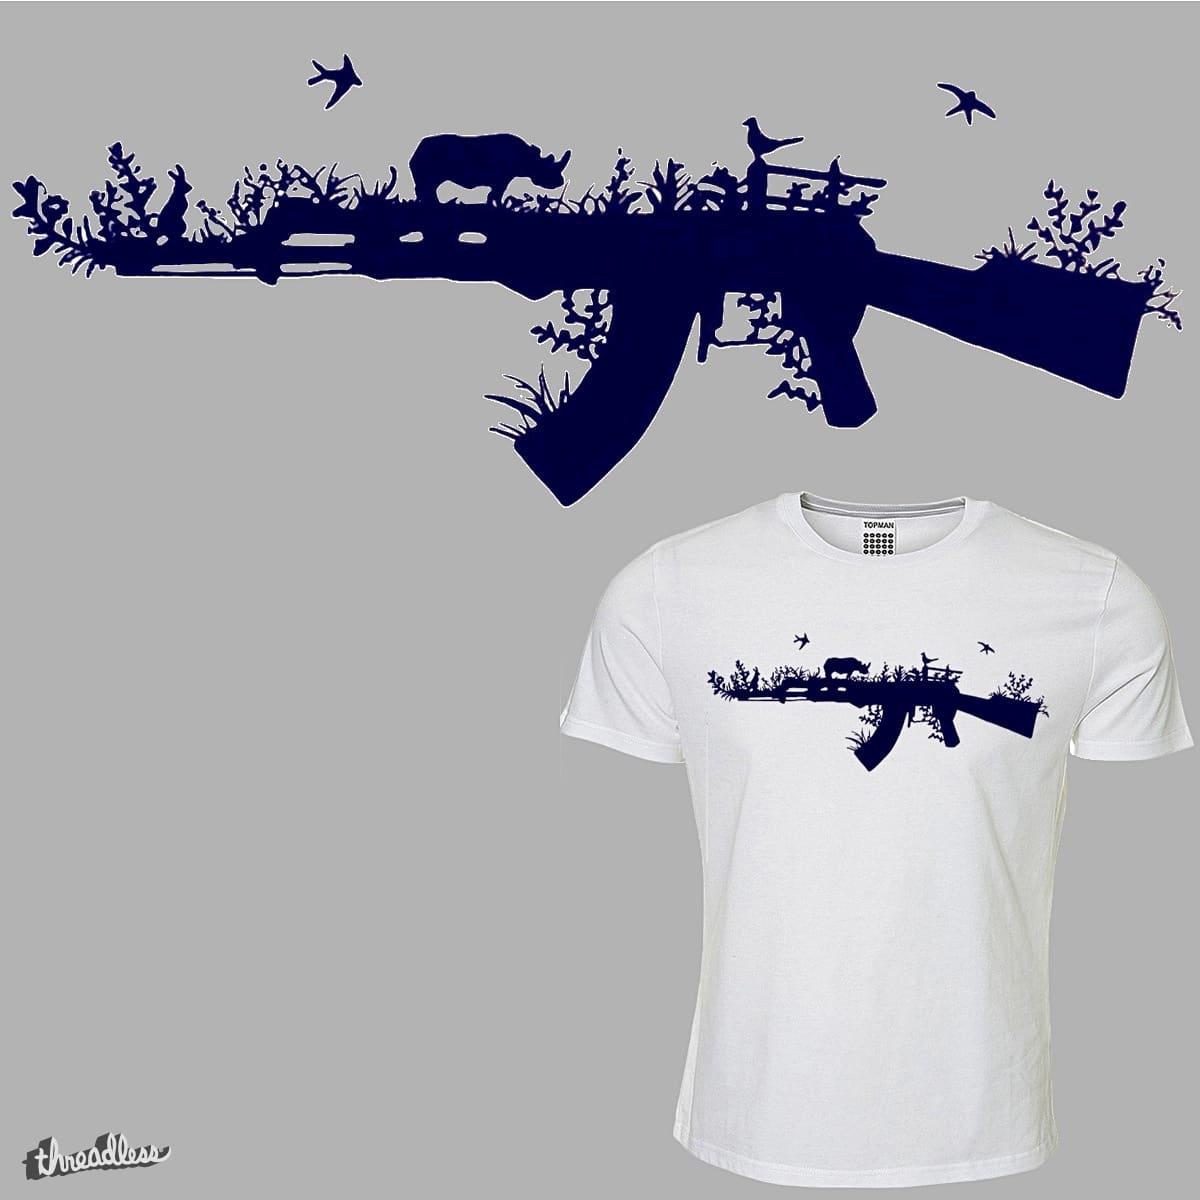 Save the Rhino Gun Illustration by supercooperbrand on Threadless